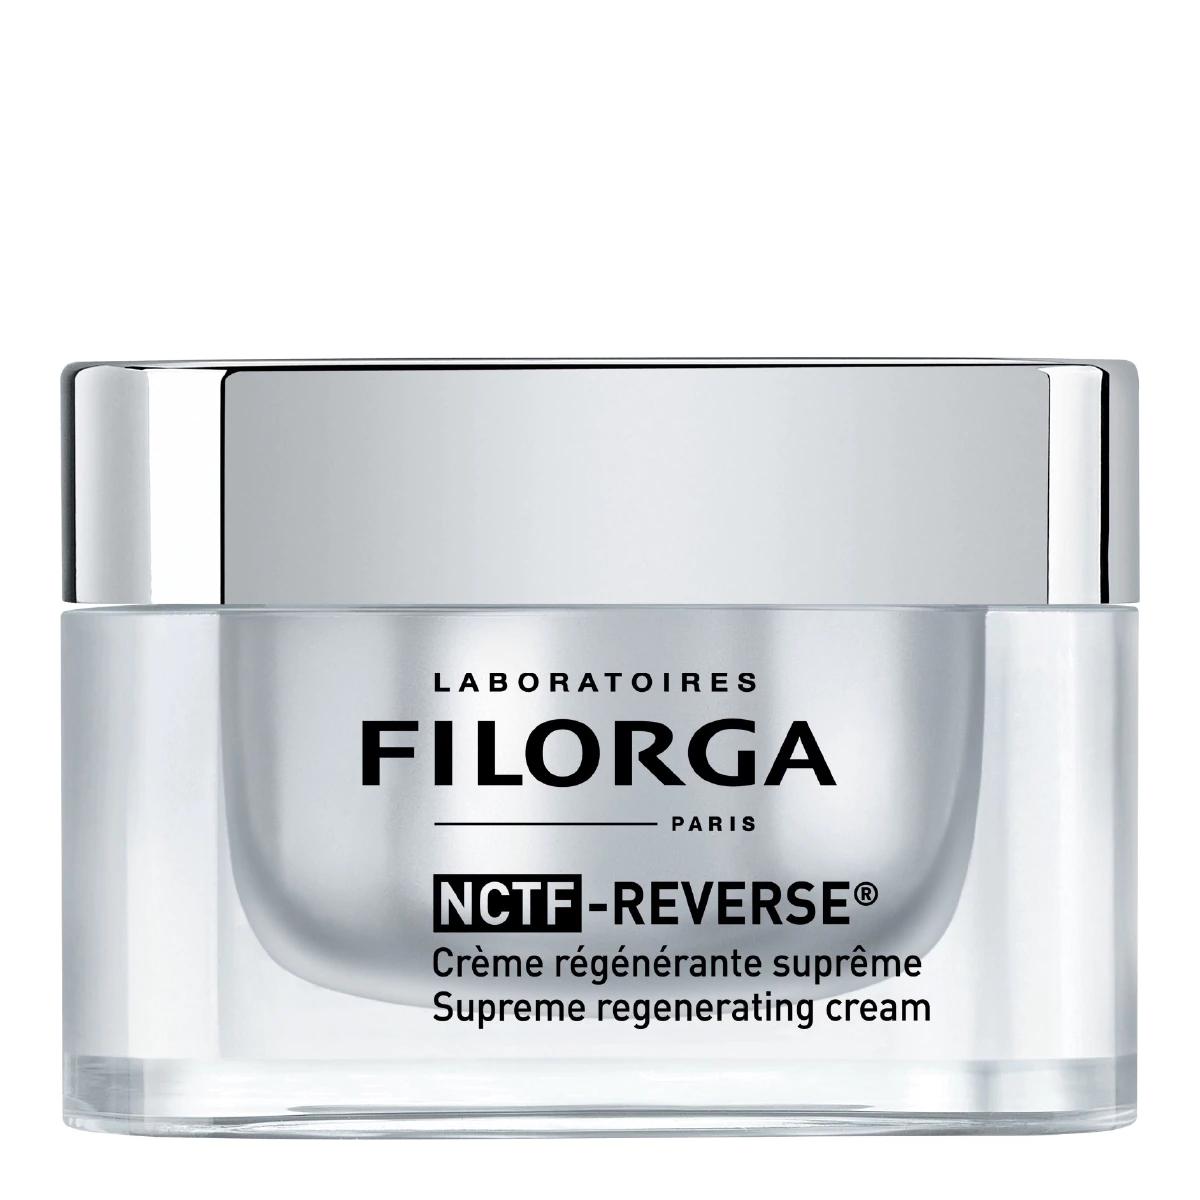 Crème Régénérante Filorga Suprême NCTF-Reverse